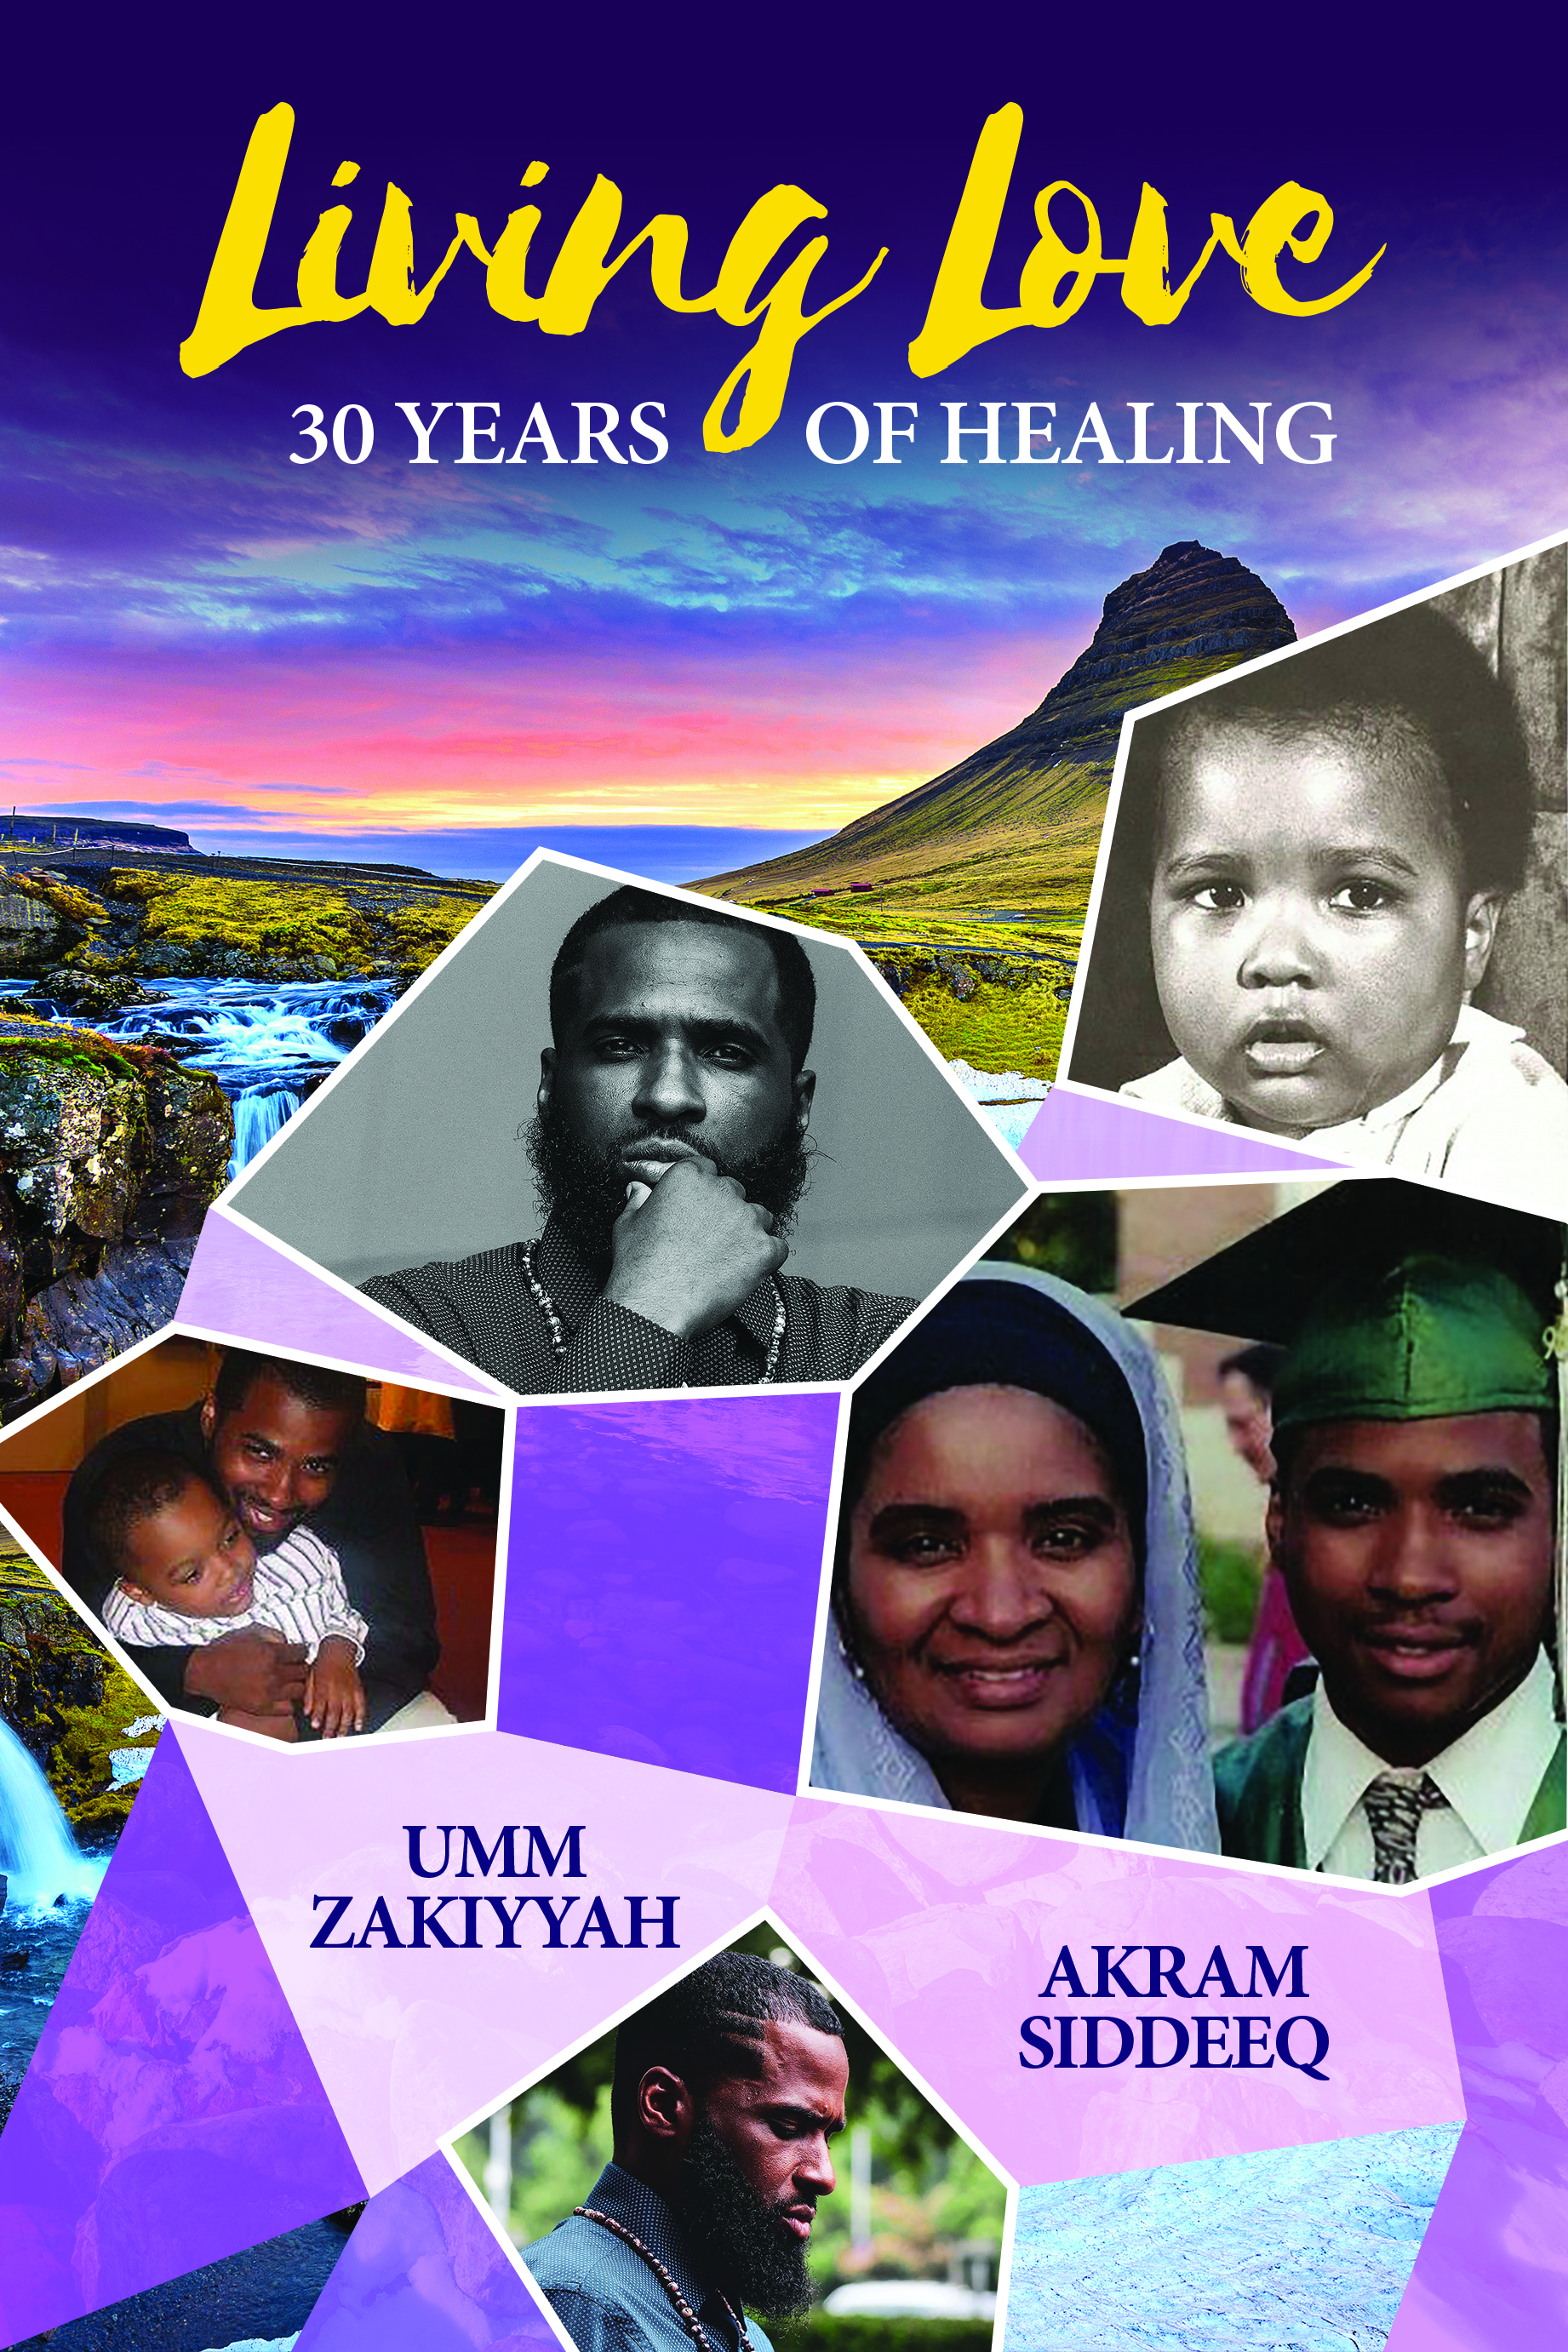 Cover photo of Living Love: 30 Years of Healing by Akram Siddeeq and Umm Zakiyyah